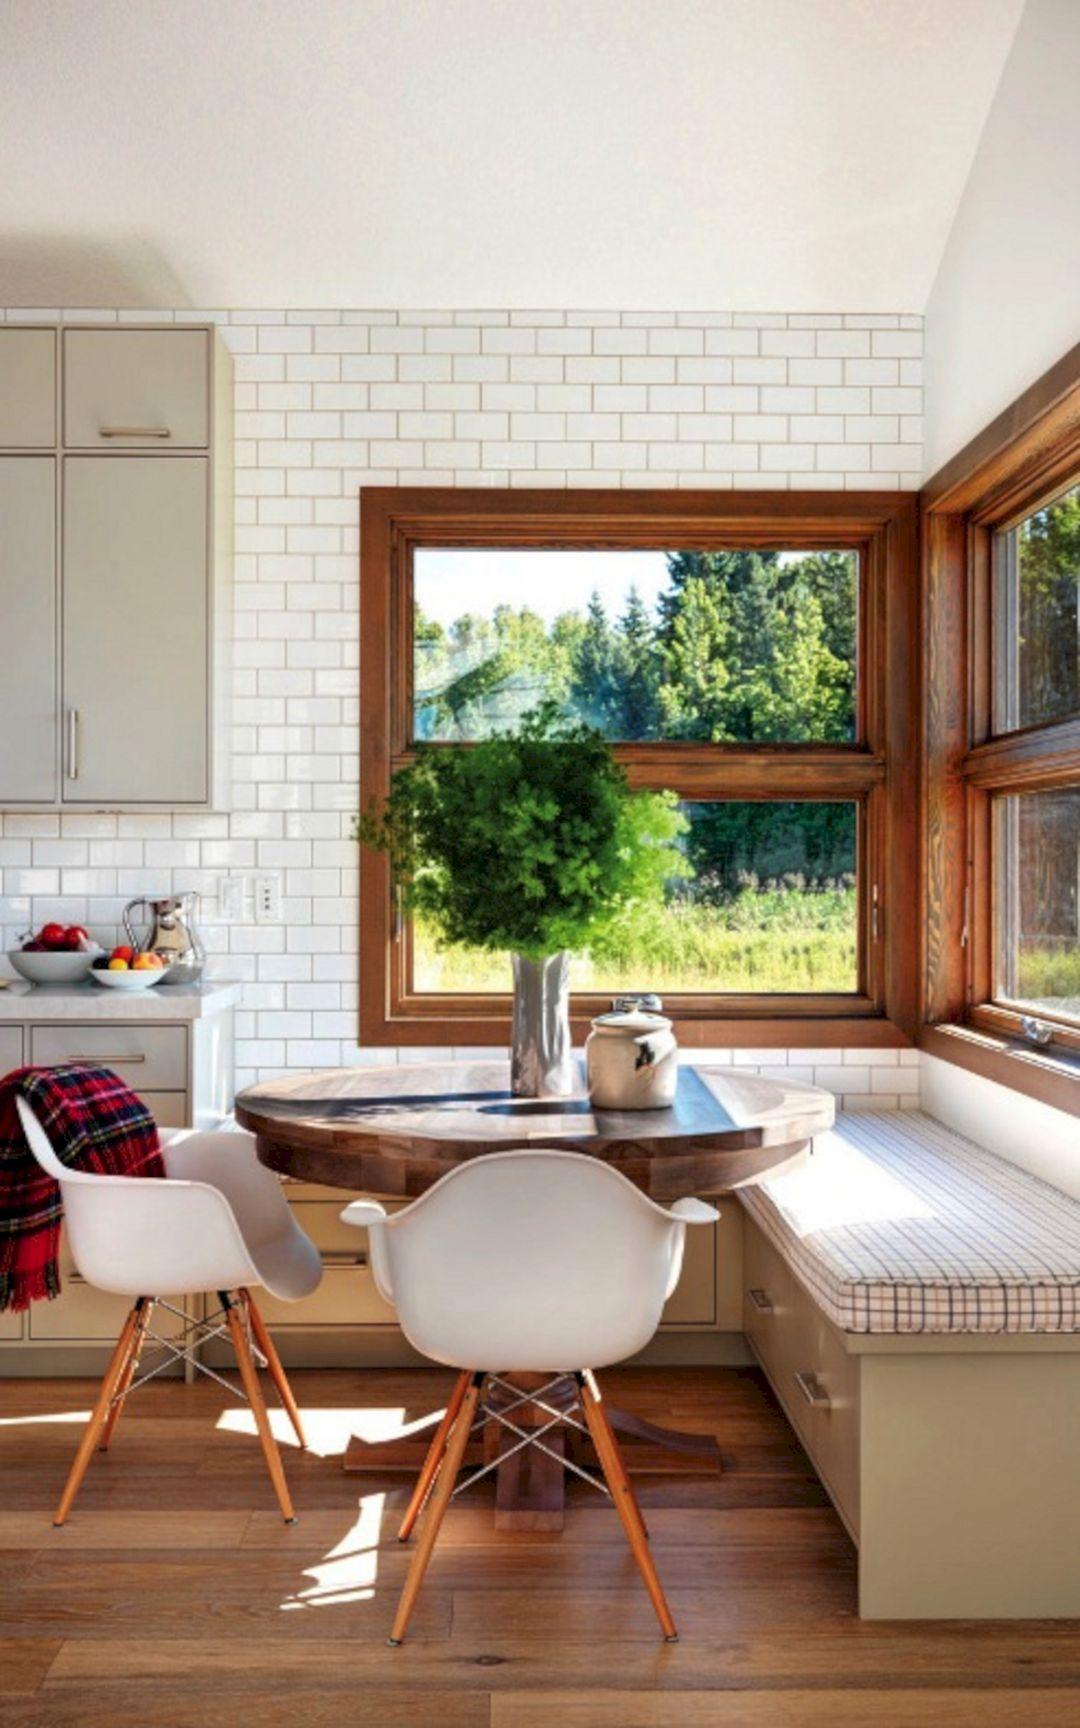 63 top mid century modern decor ideas for awesome home freshouz com home kitchens kitchen on kitchen decor themes modern id=12567